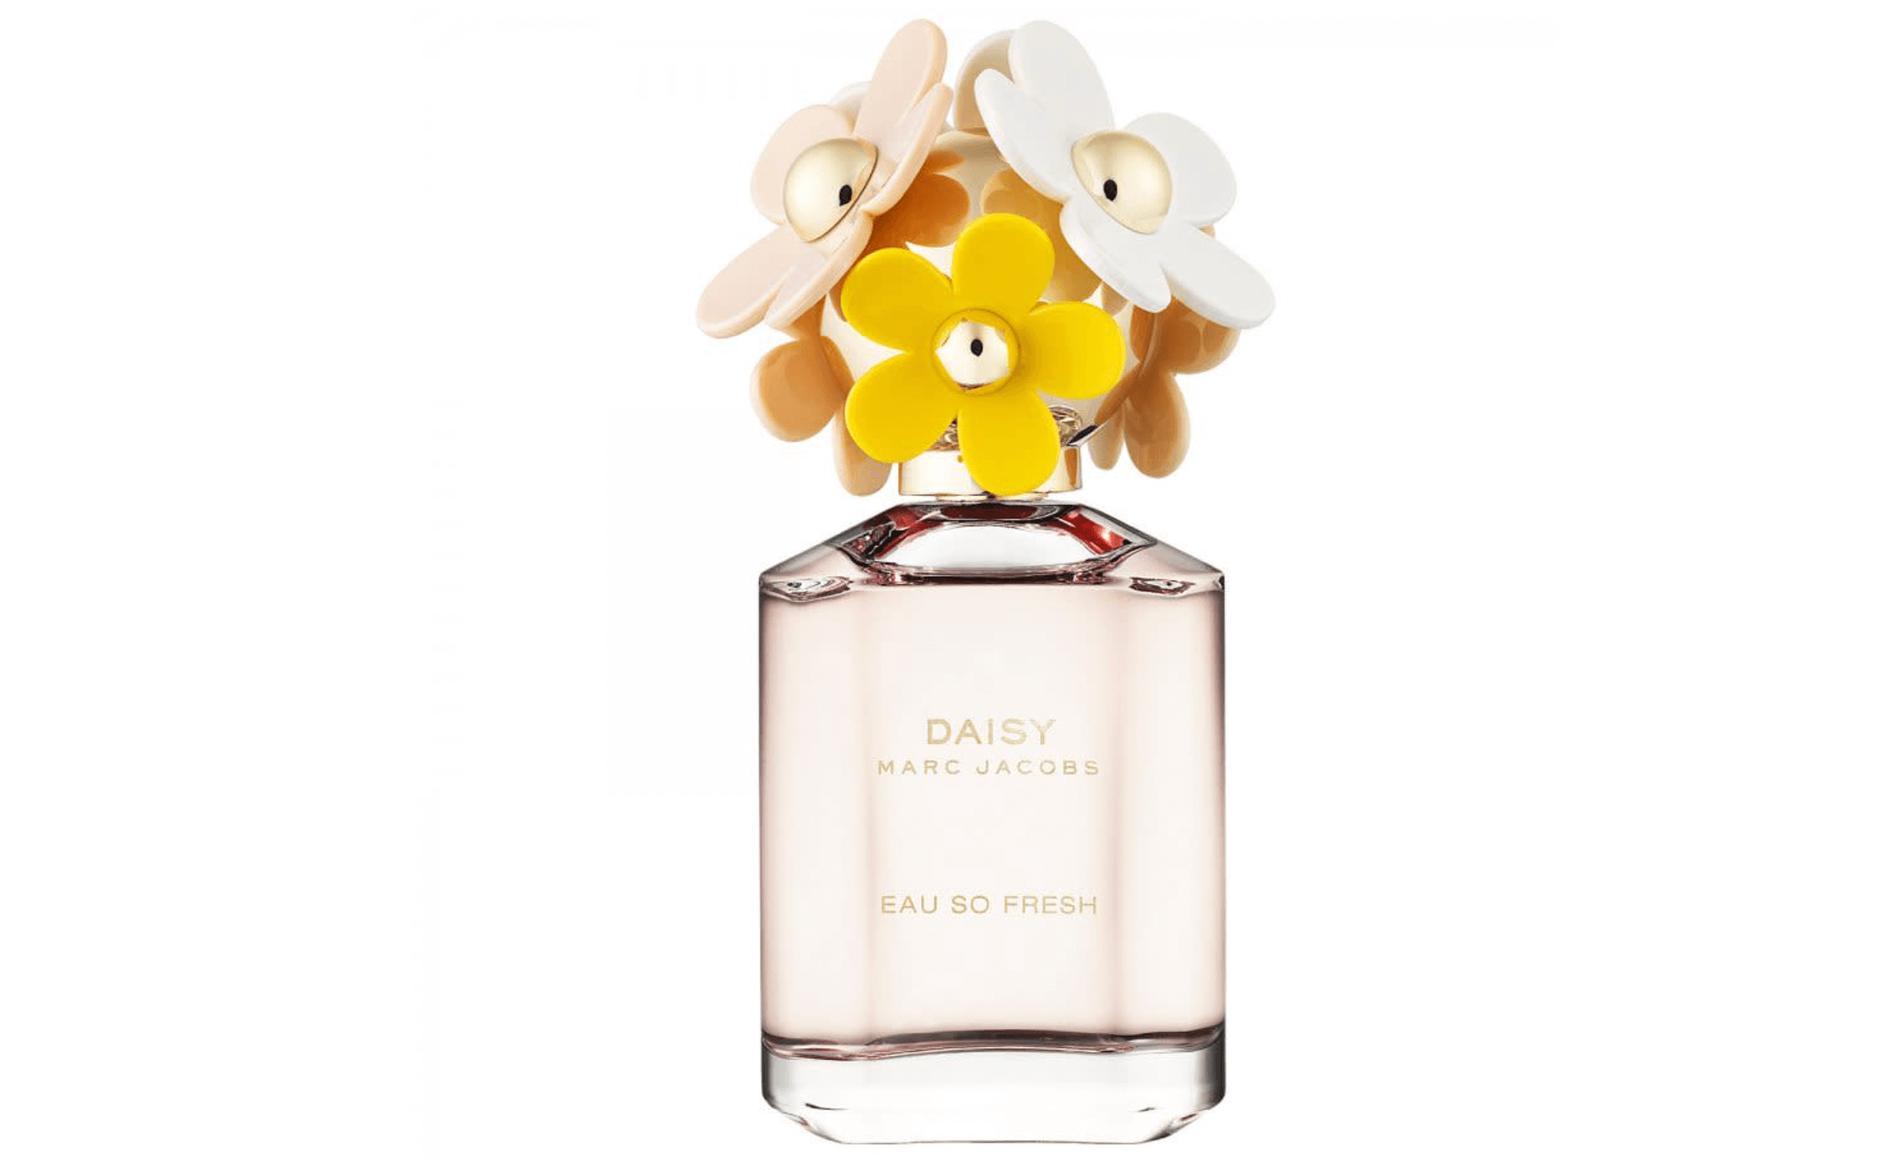 Marc Jacobs Parfym – Daisy Eau So Fresh